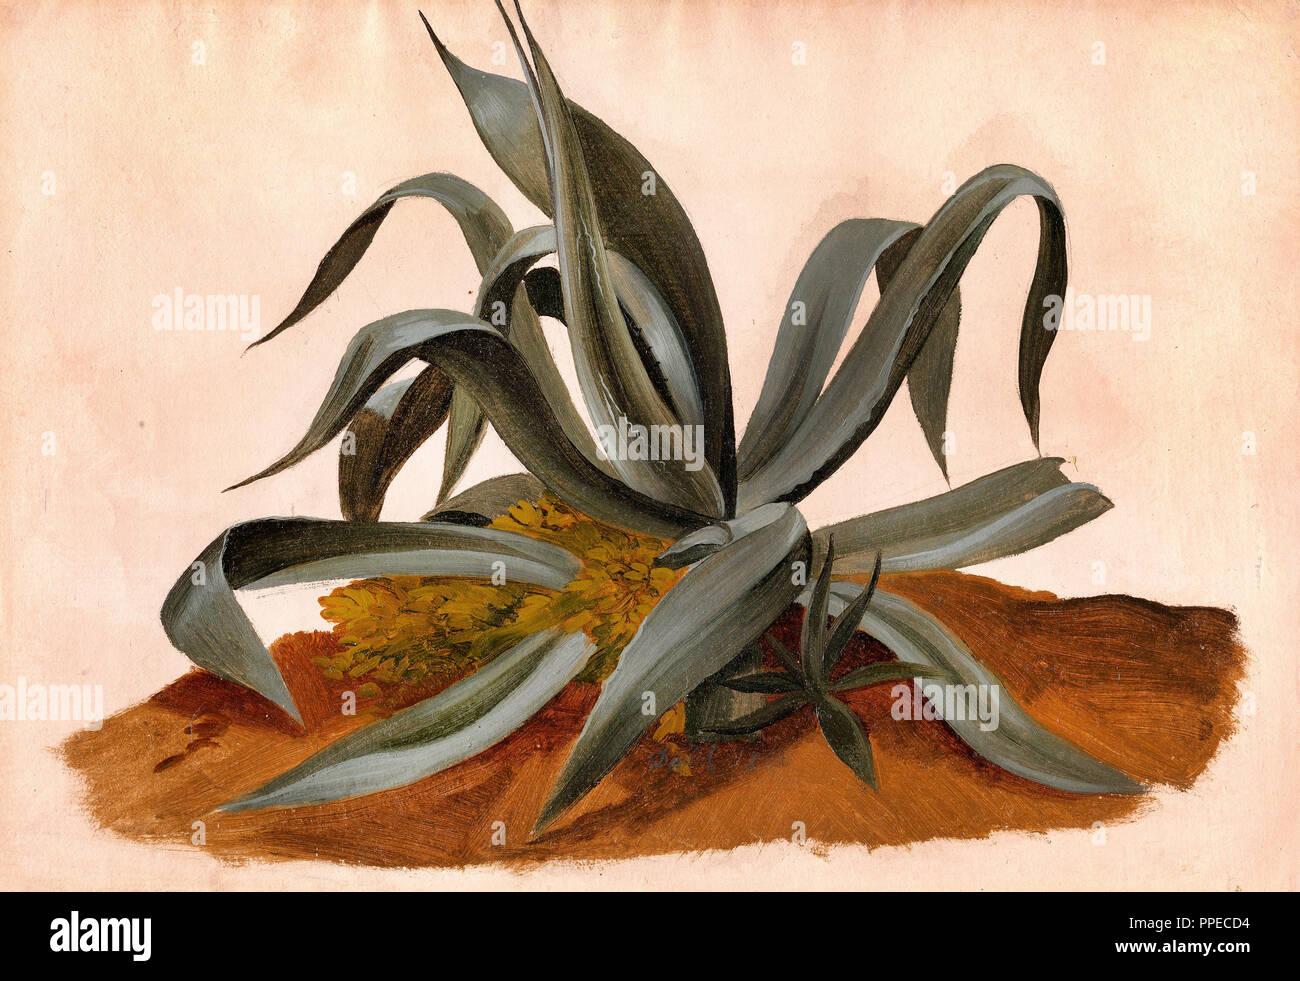 Johan Christian Dahl - Estudio de un agave 1820 Óleo sobre lienzo. Galería Nacional de Noruega, Oslo, Noruega. Imagen De Stock